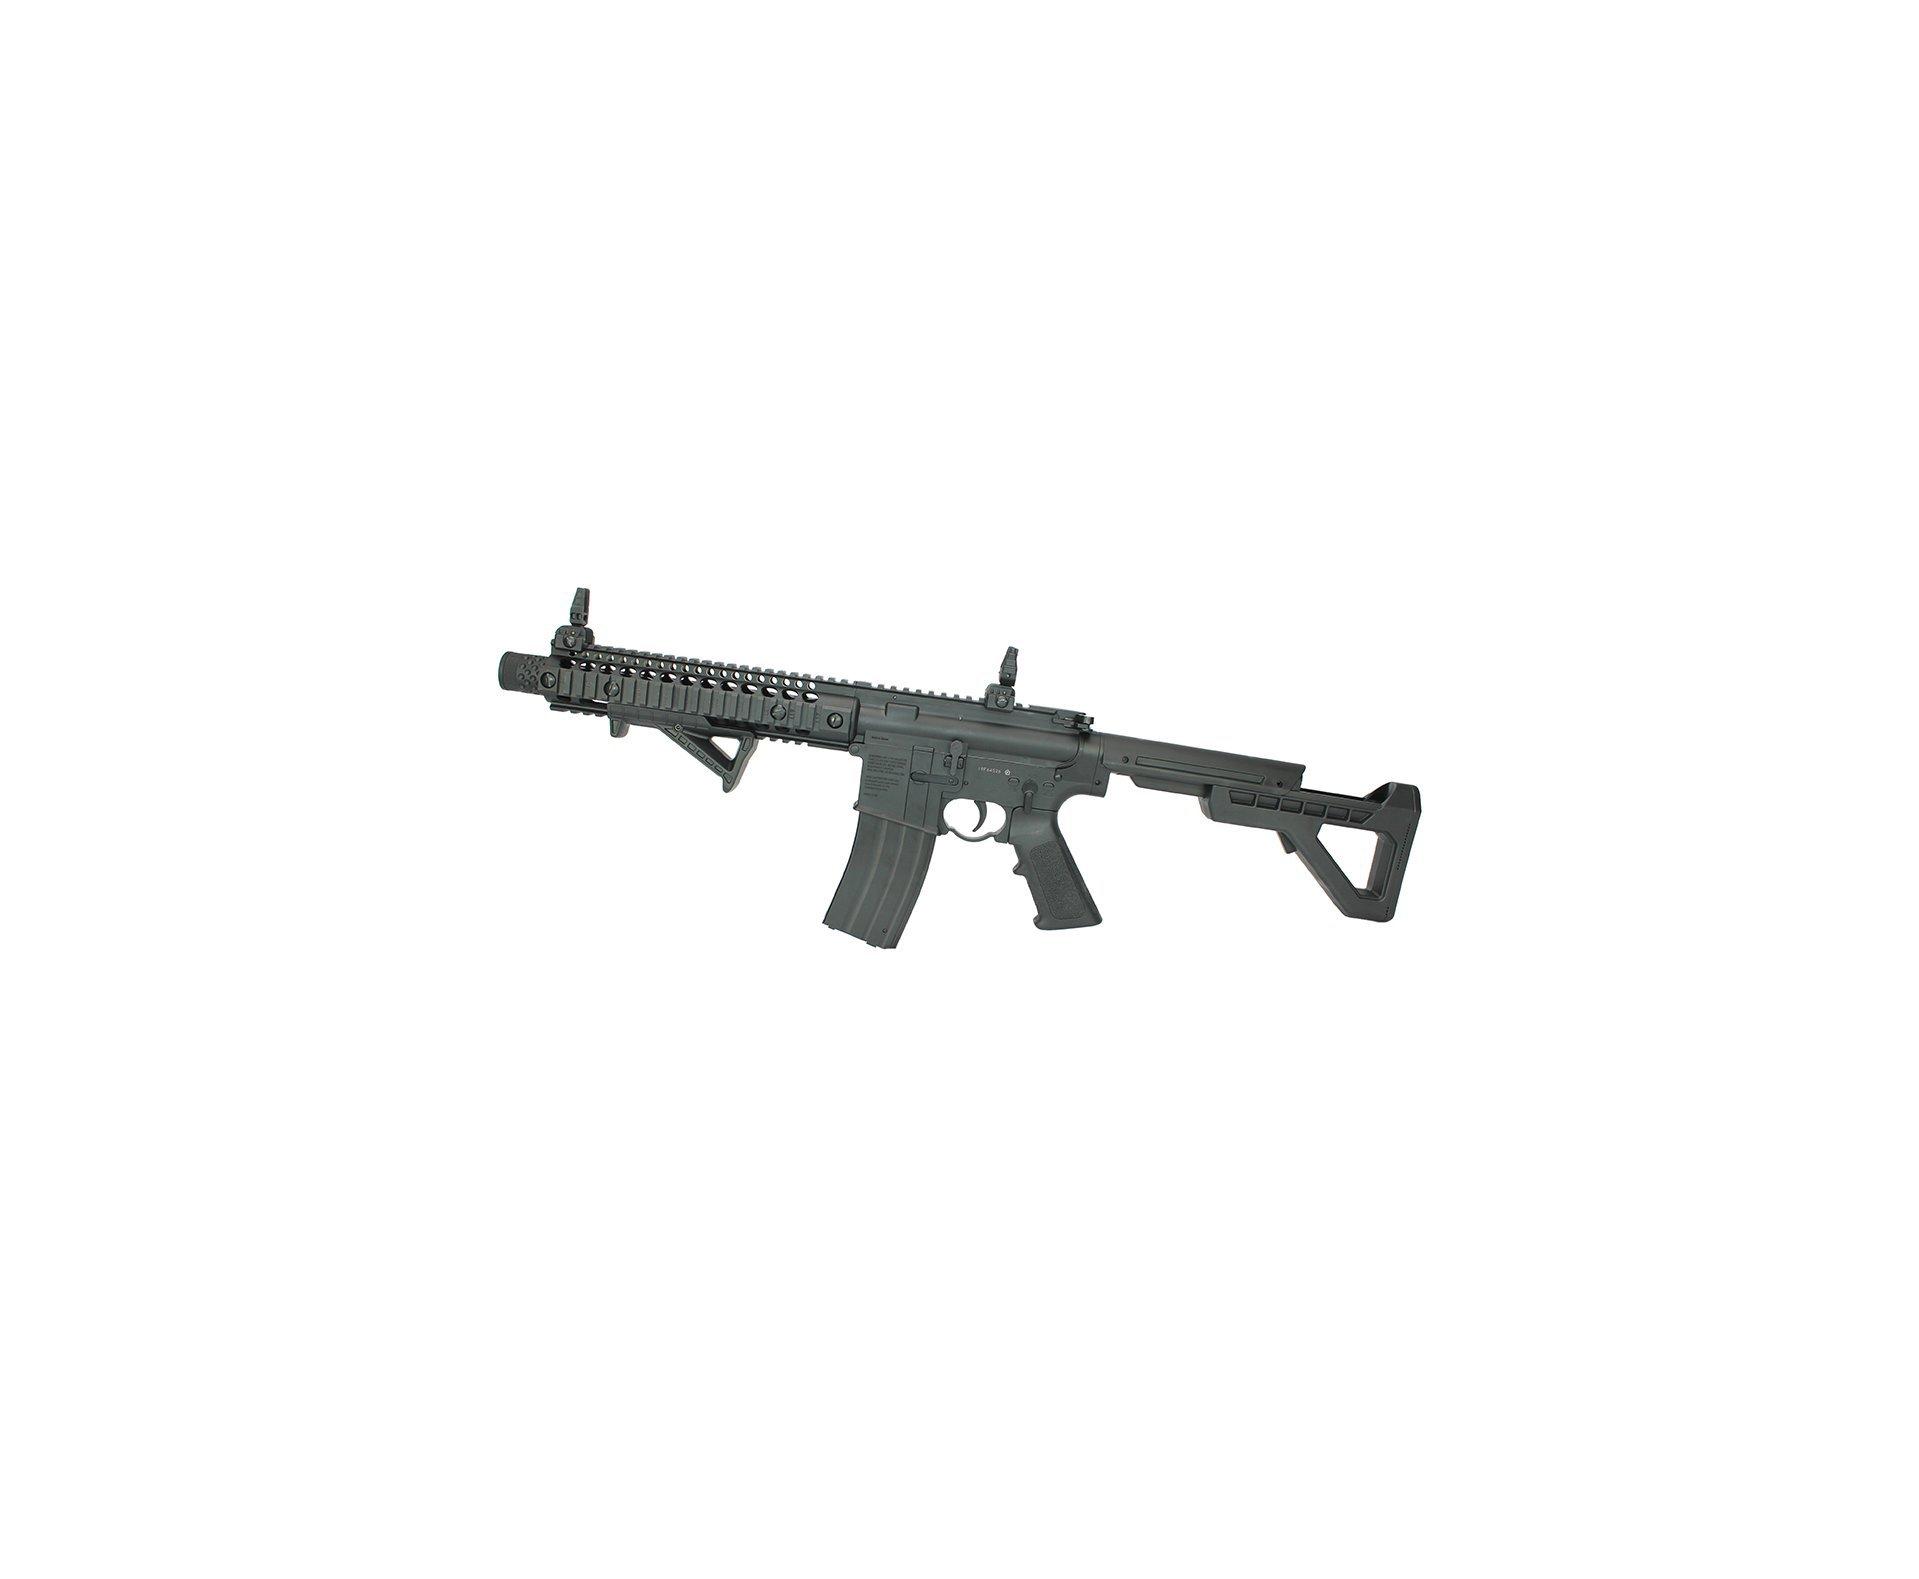 Rifle Pressão Co2 Dpms Sbr M4 Full Metal Blowback Automatico 4,5mm - Phanter Arms